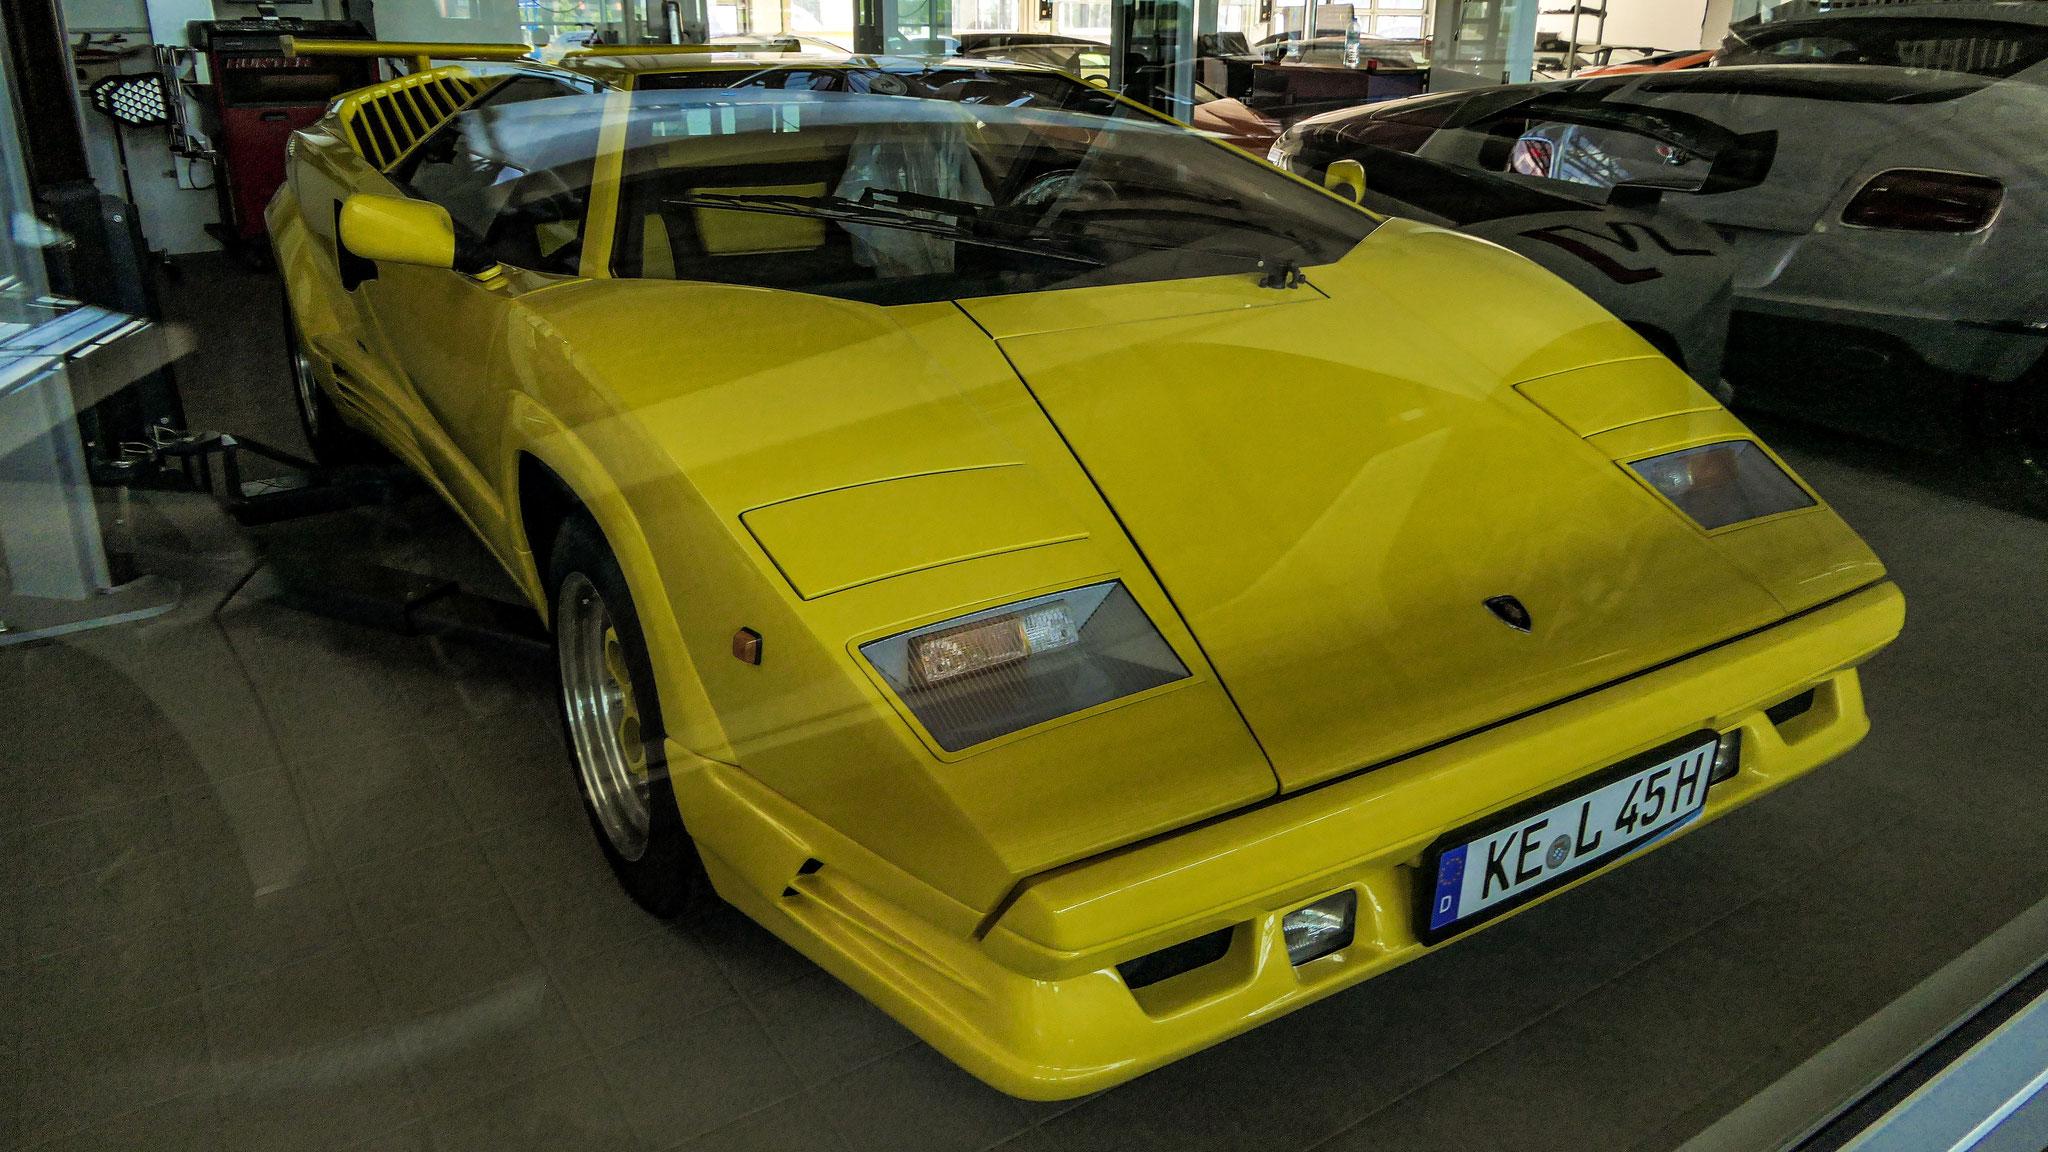 Lamborghini  Countach - KE-L-45H